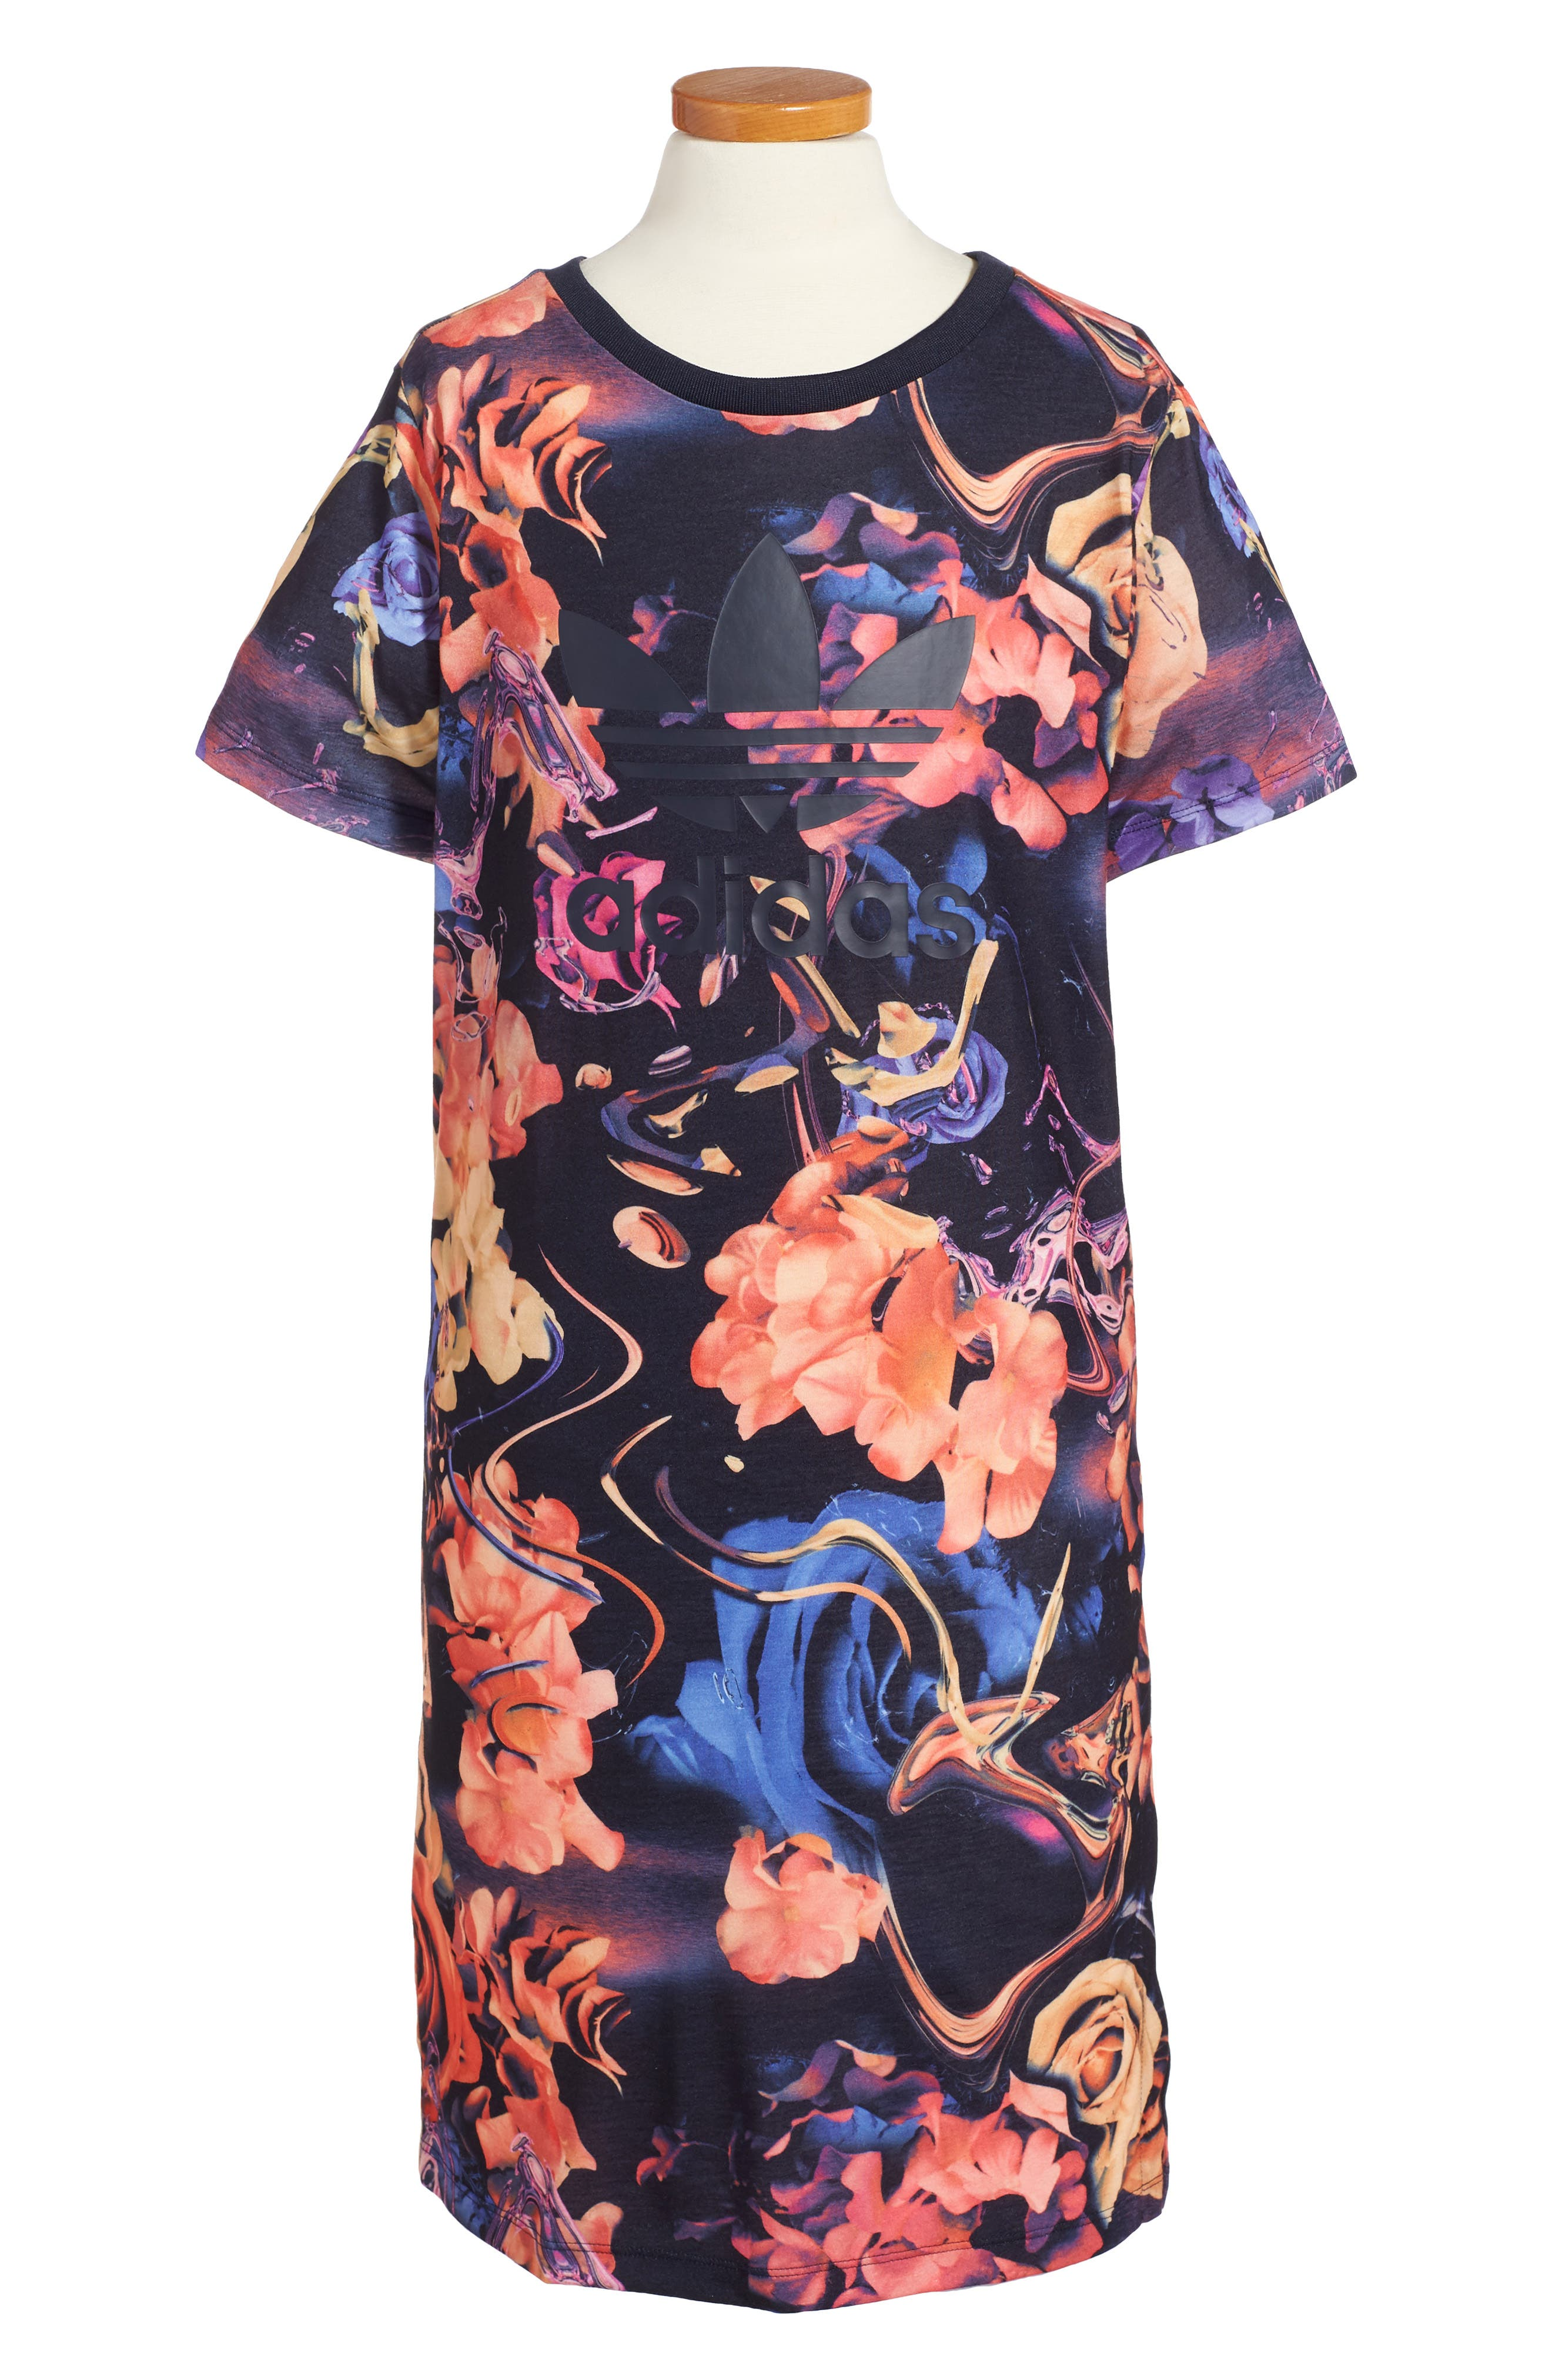 Alternate Image 1 Selected - adidas Originals Rose Print T-Shirt Dress (Big Girls)